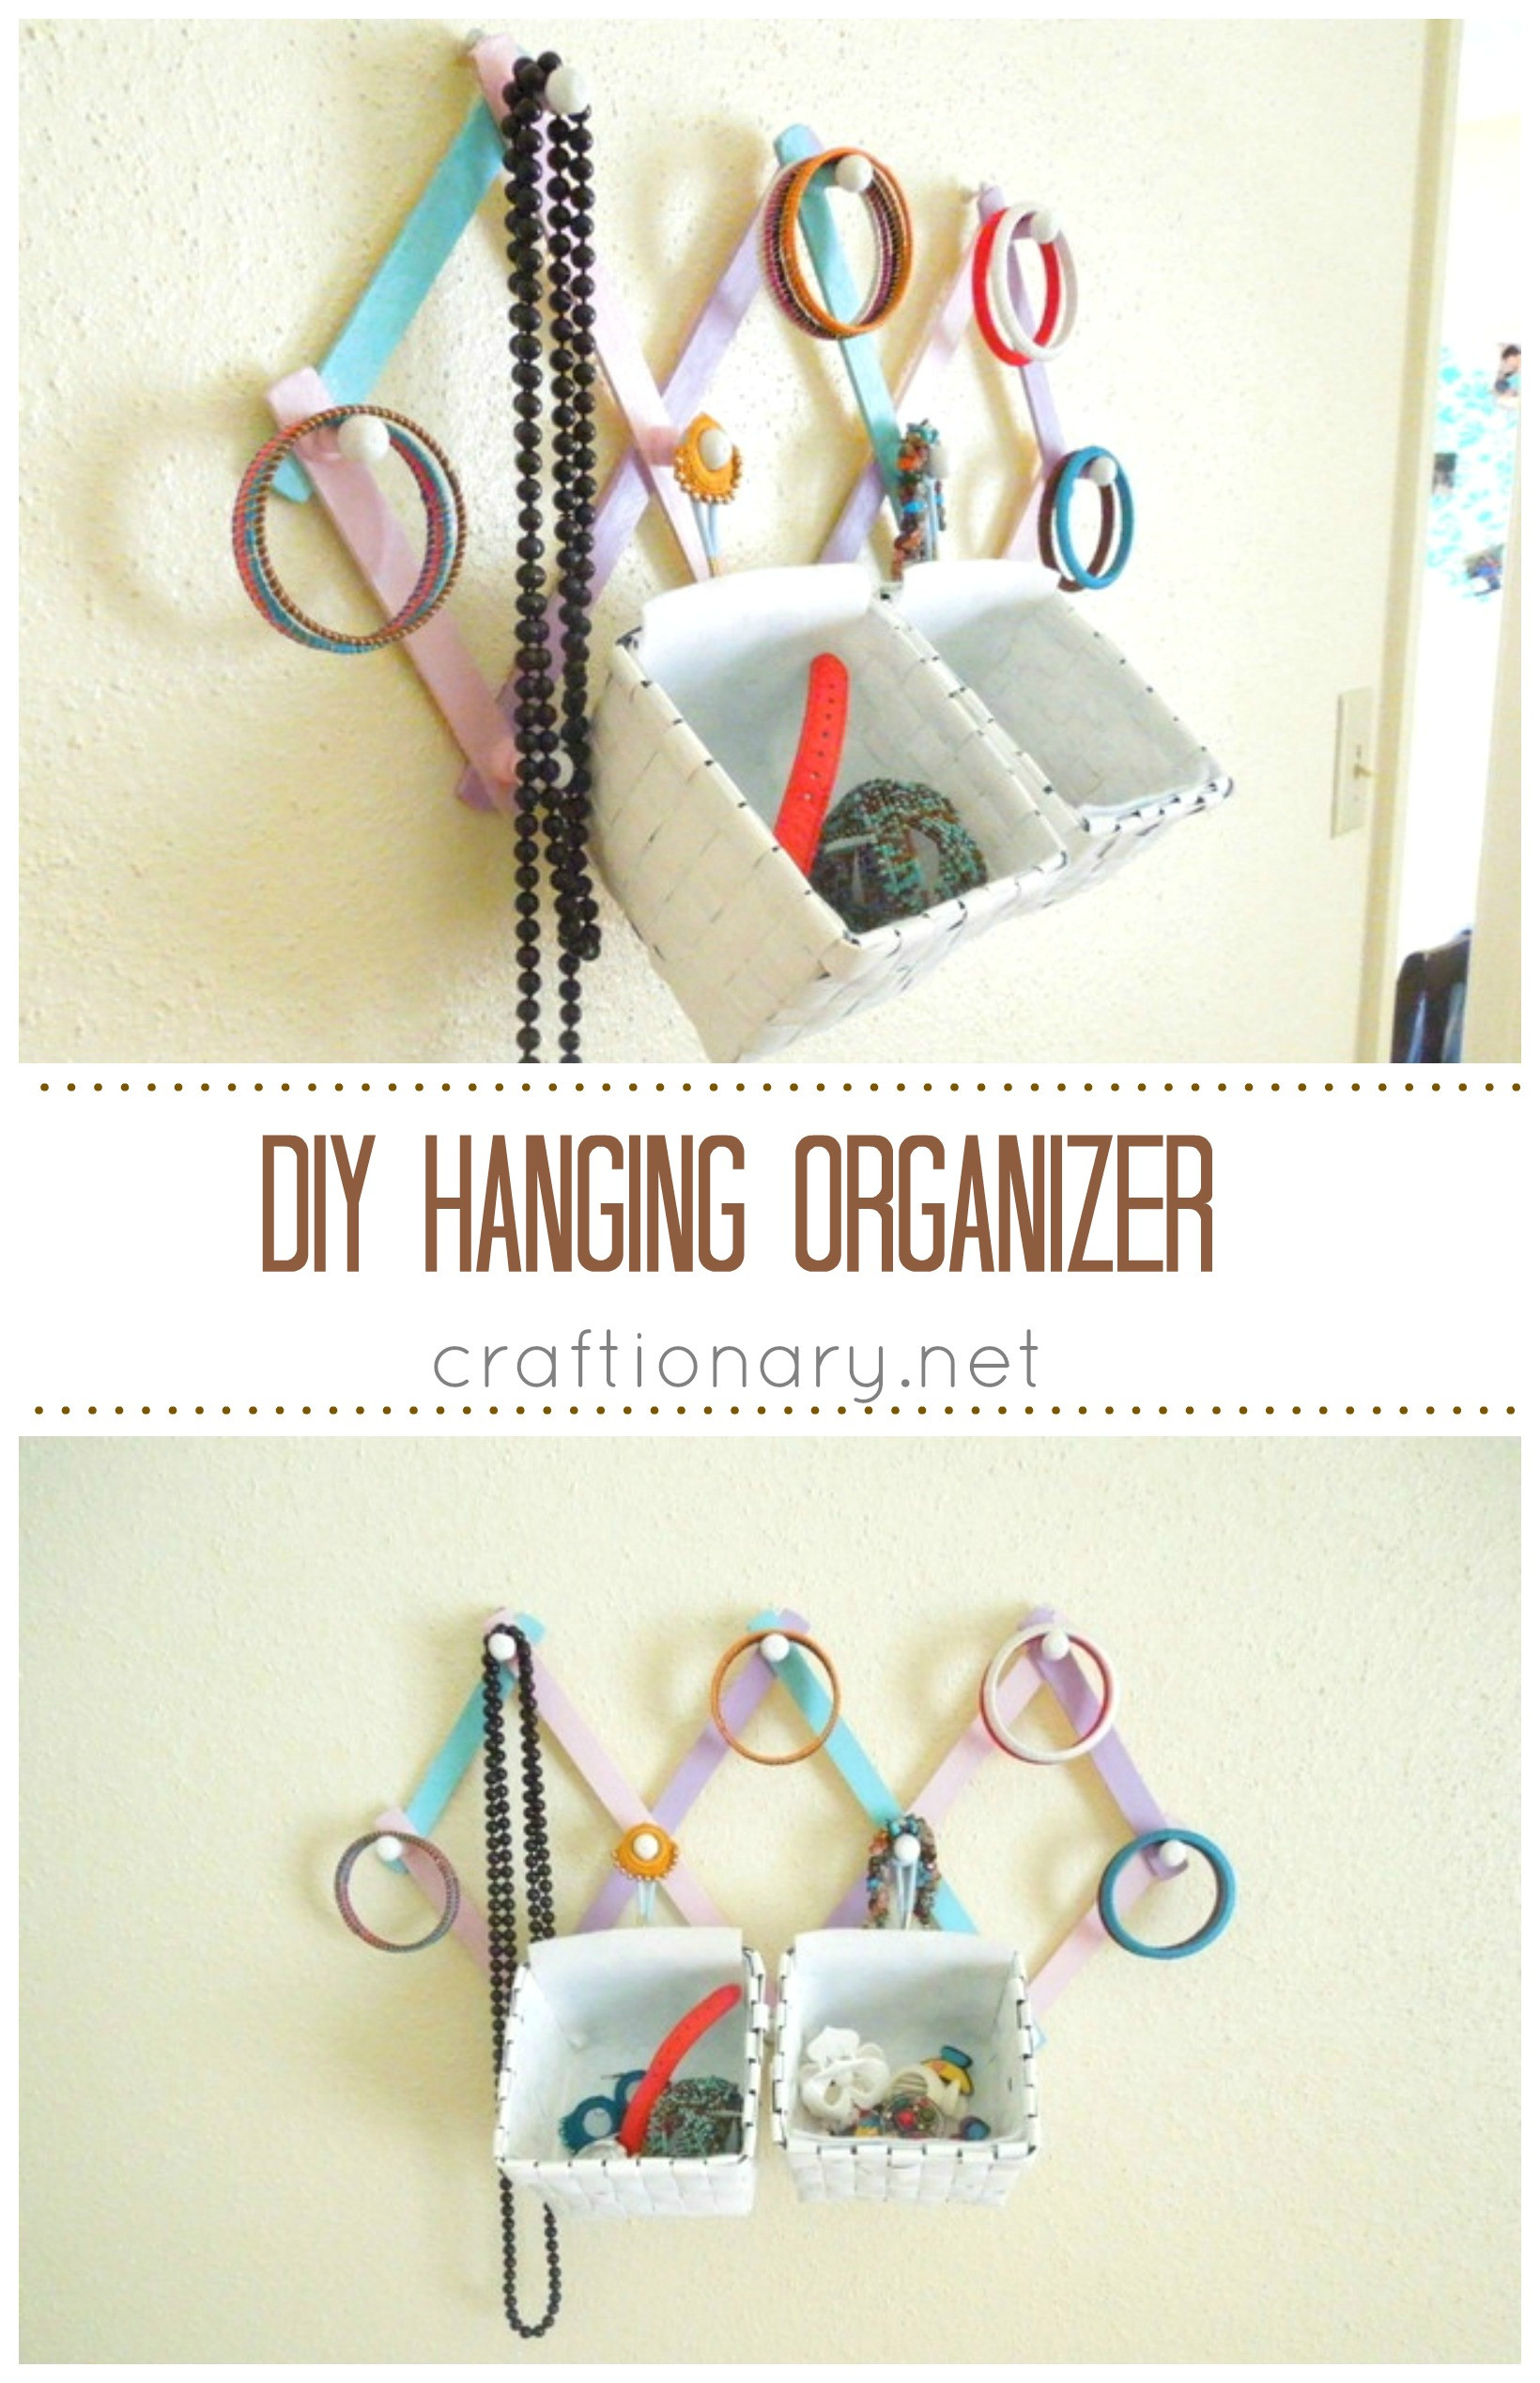 DIY Hanging Organizer  Craftionary